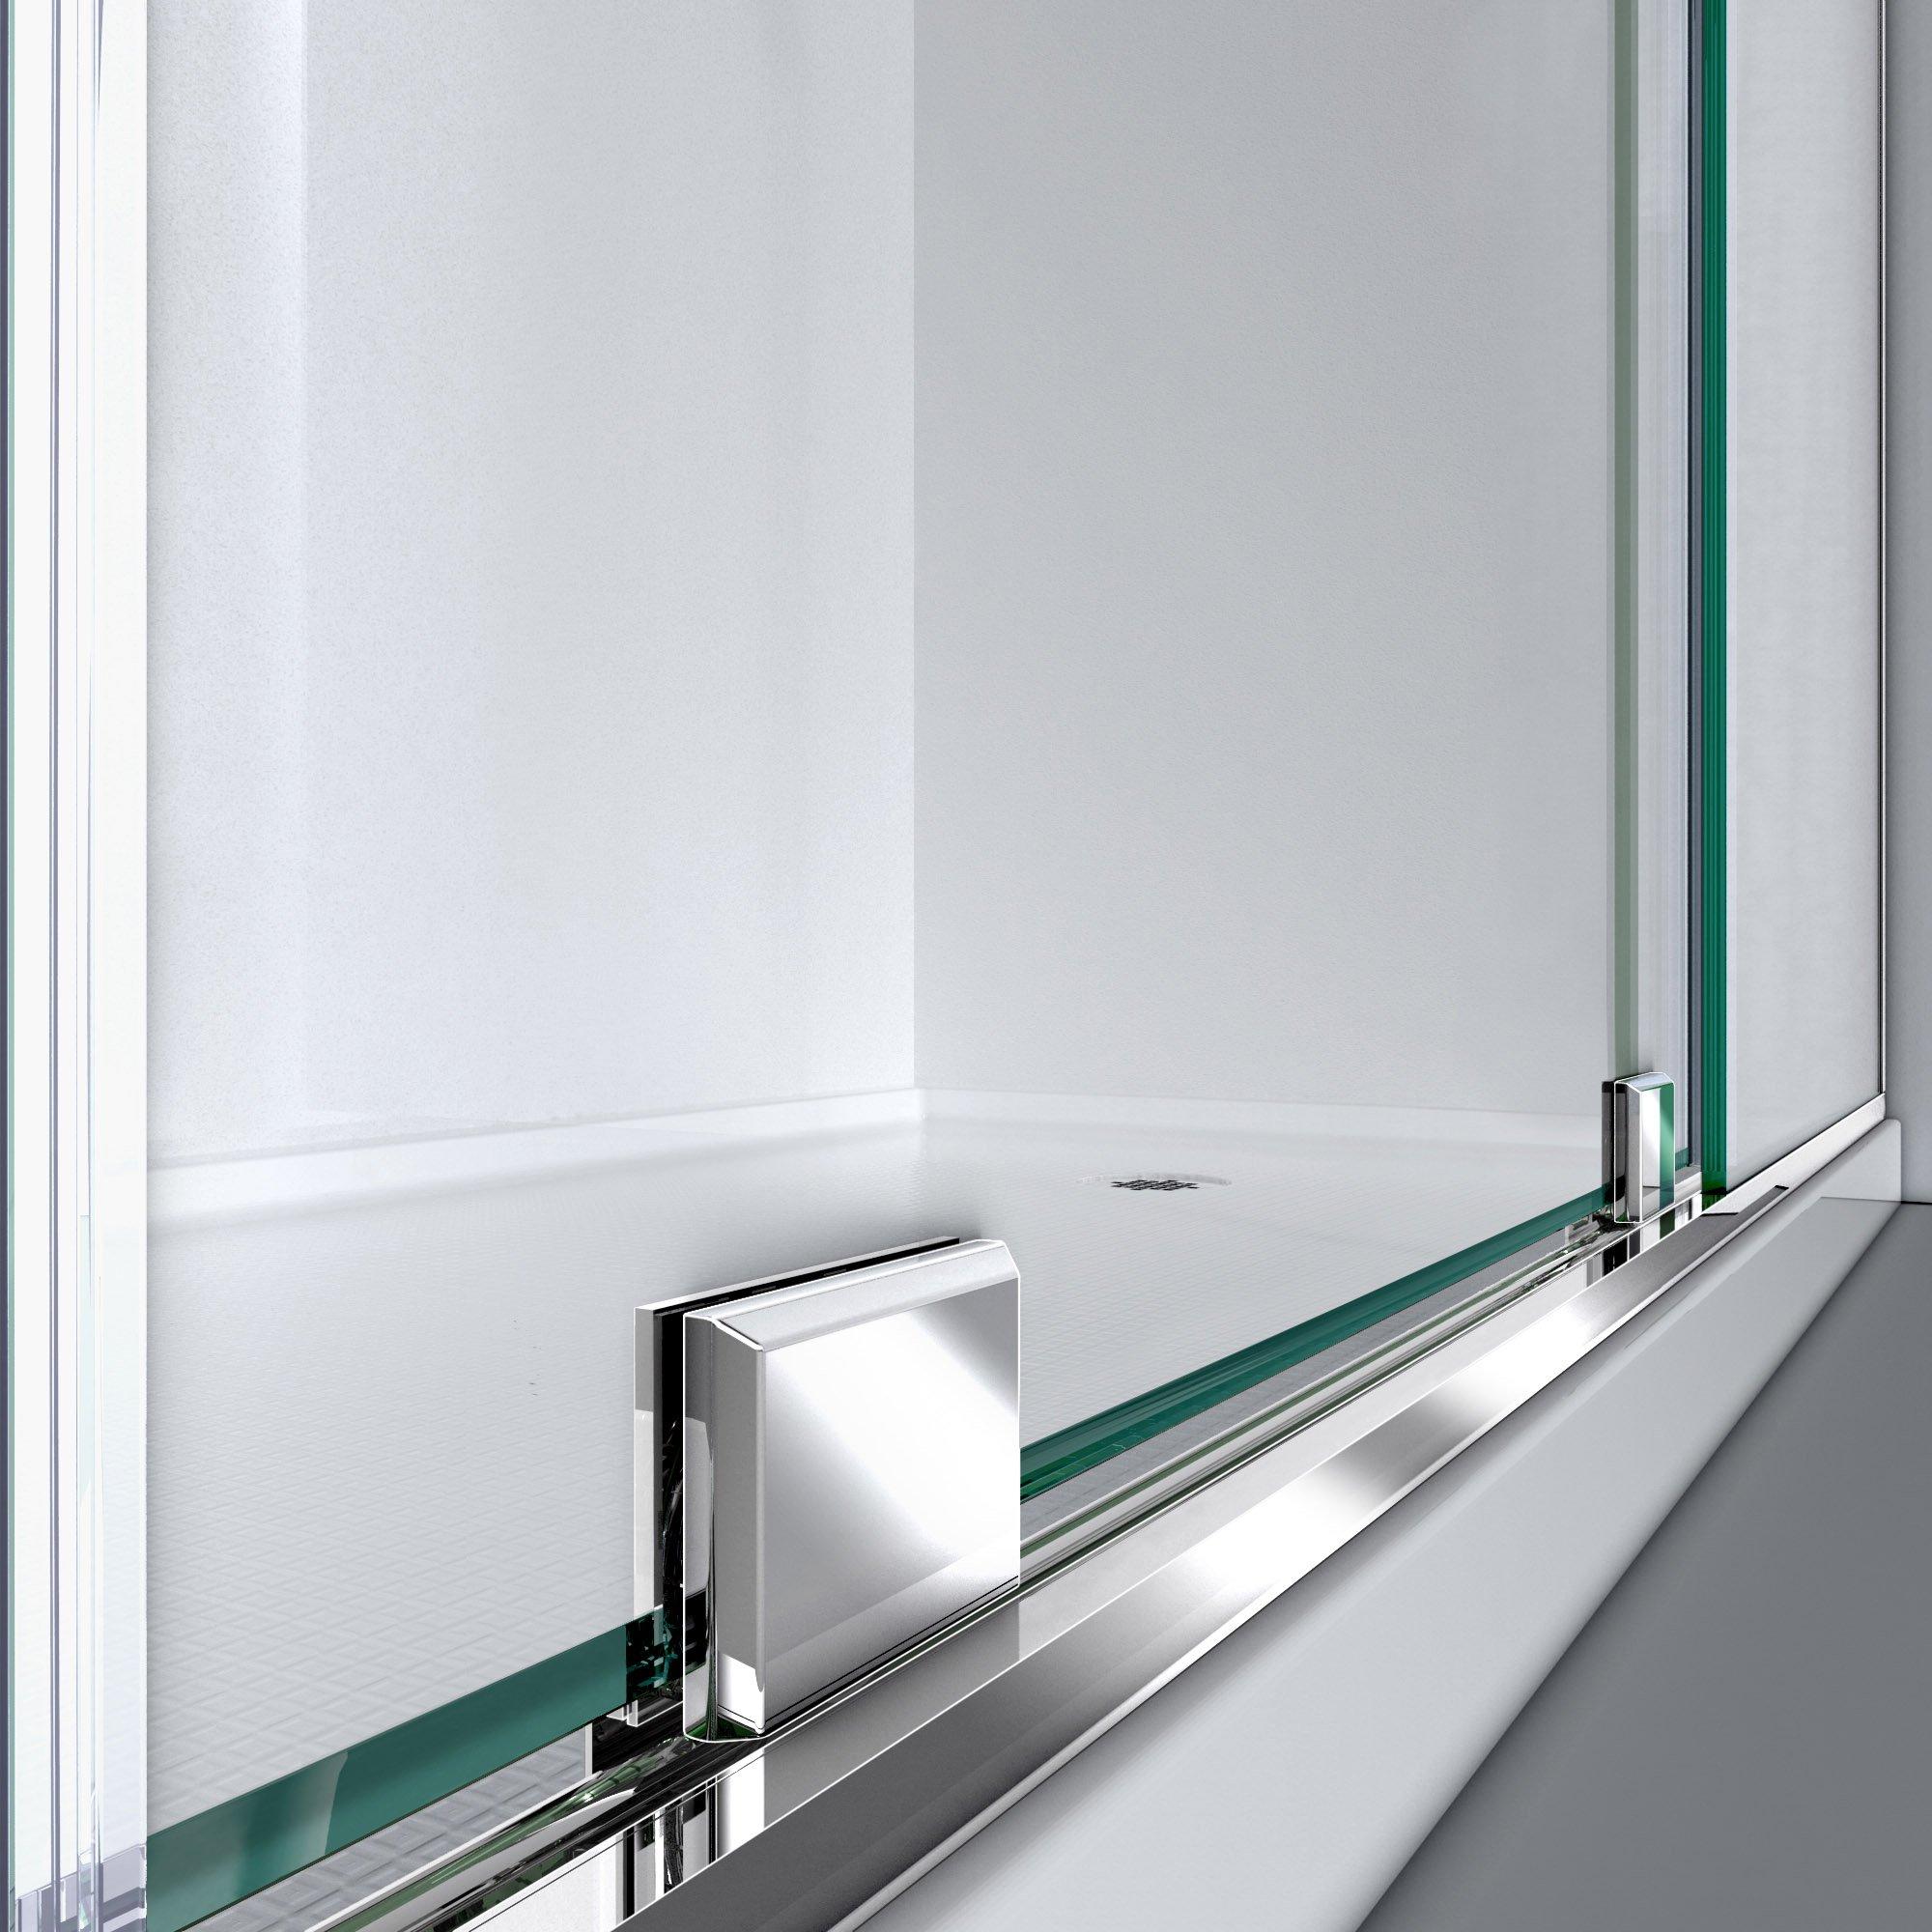 DreamLine Mirage-X 56-60 in. Width, Frameless Sliding Shower Door, 3/8'' Glass, Brushed Nickel Finish by DreamLine (Image #6)